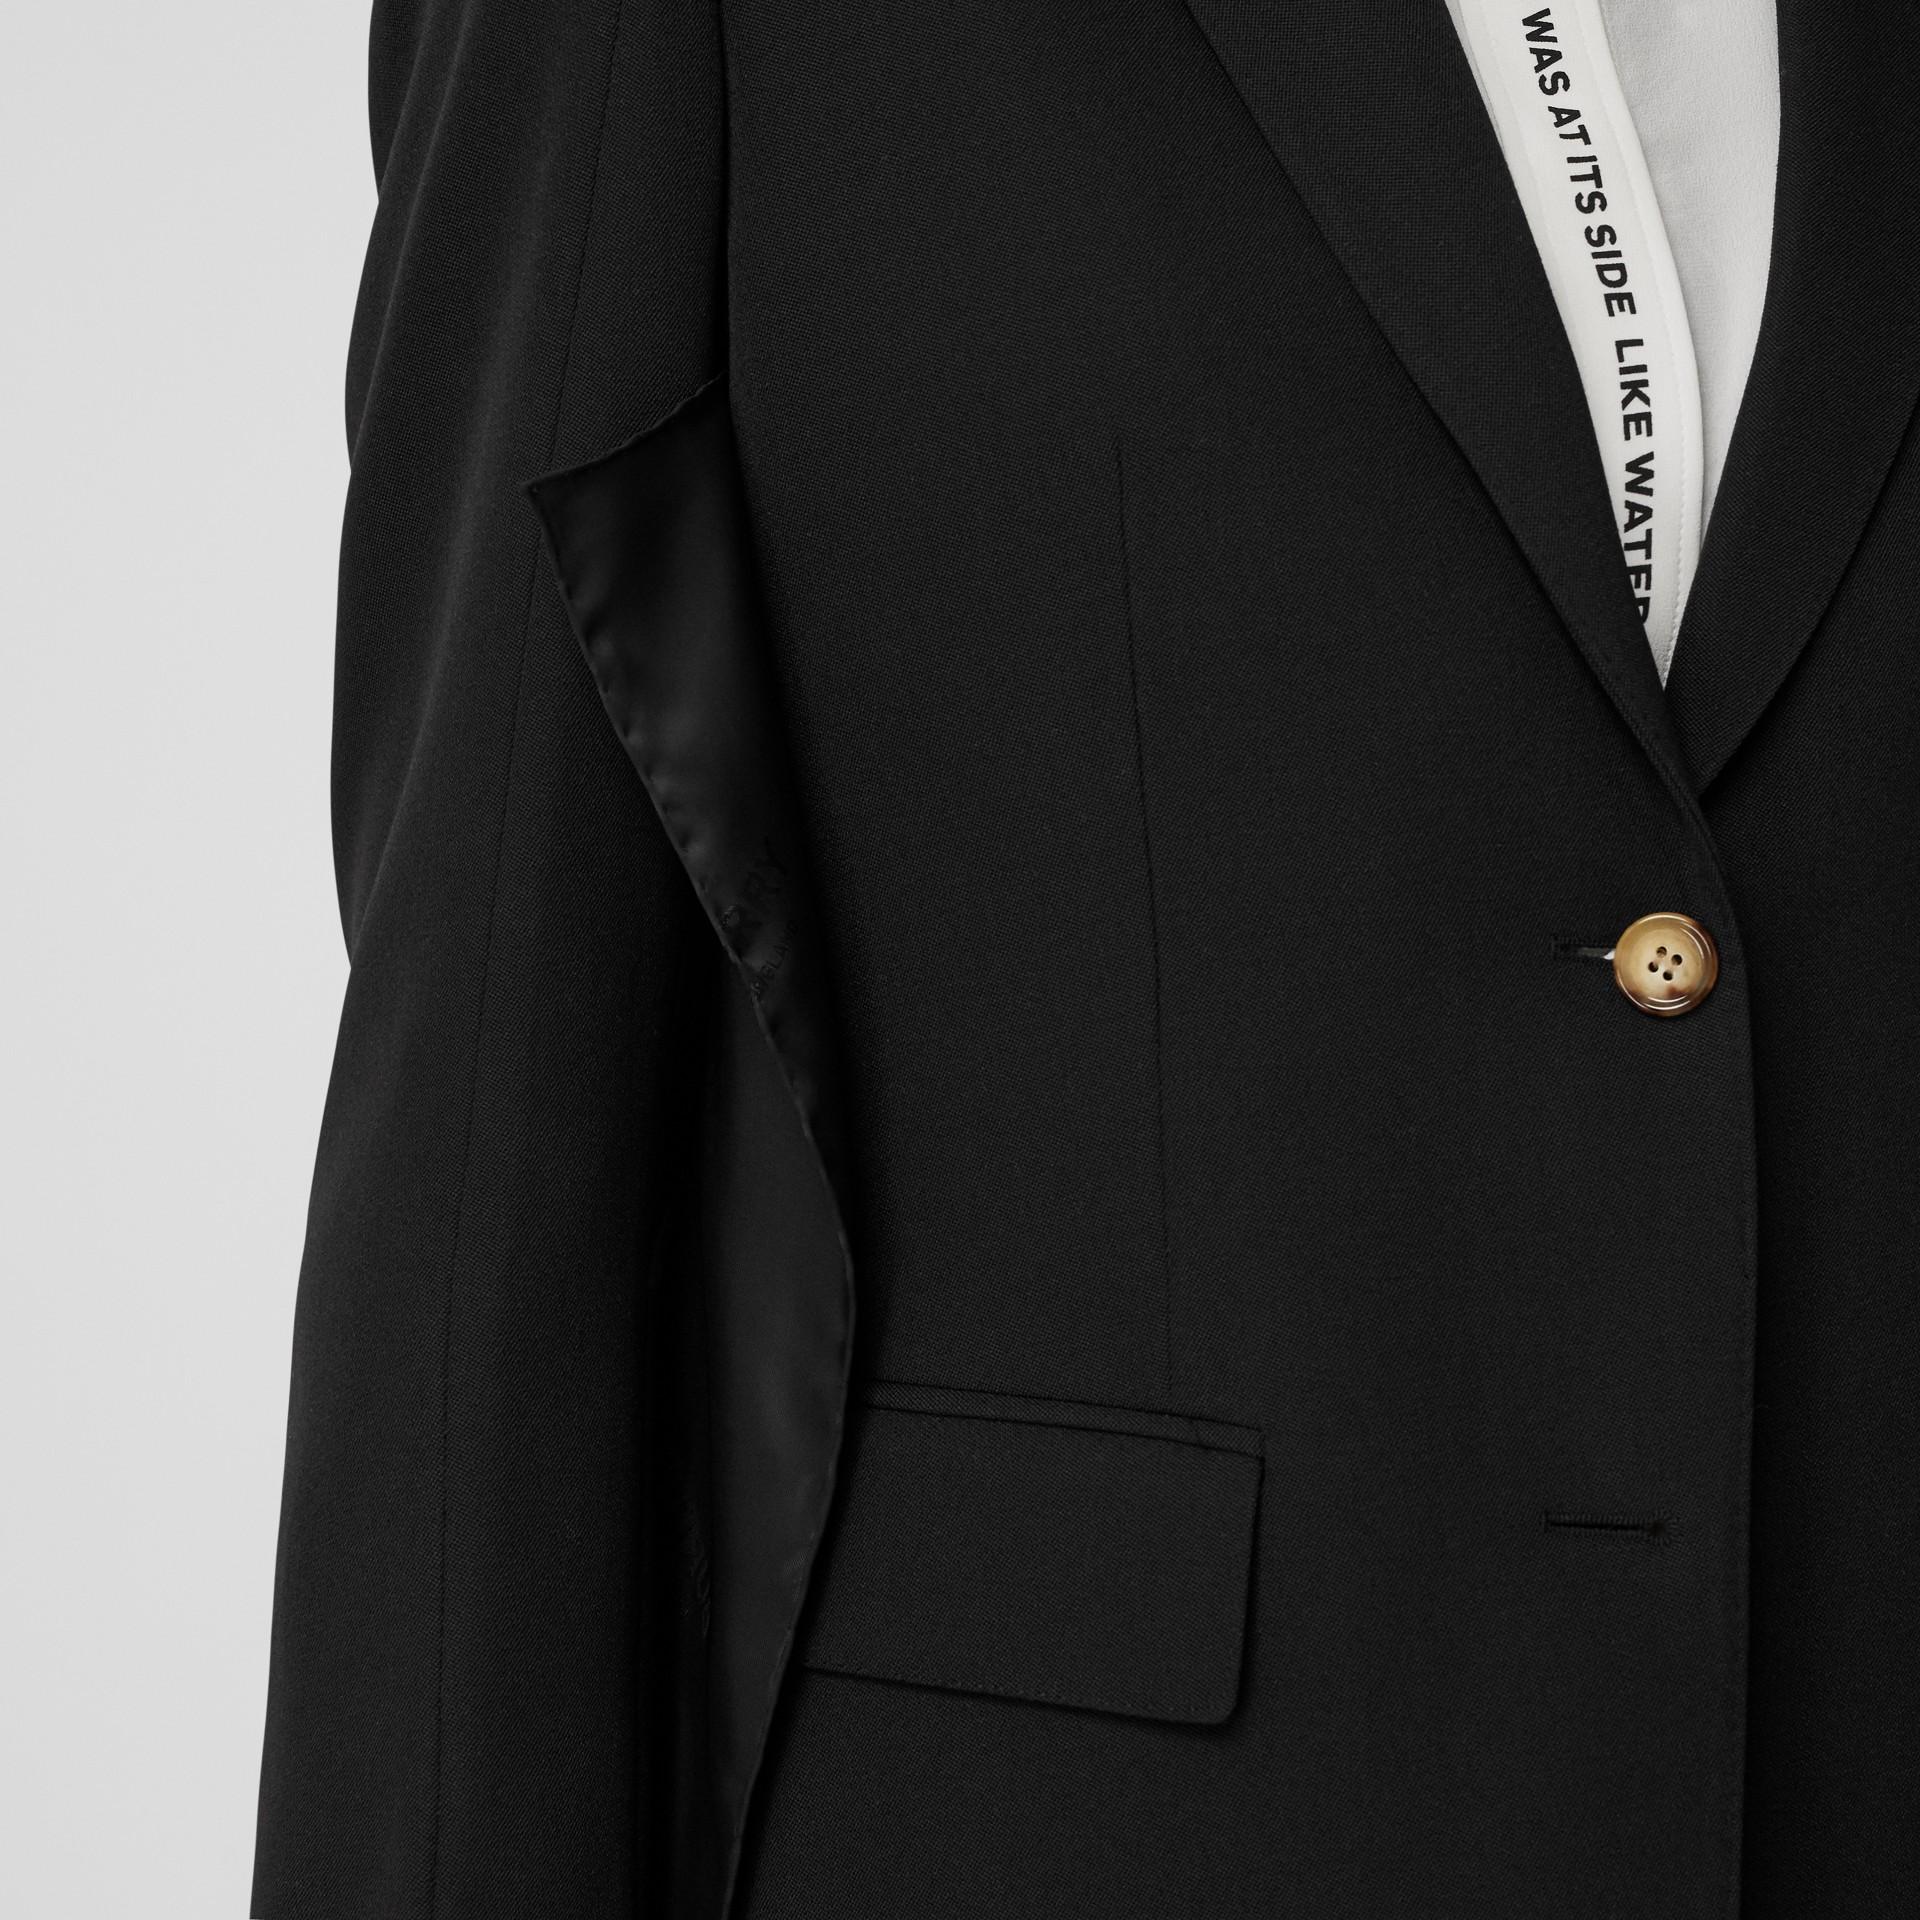 Logo Panel Detail Wool Tailored Jacket in Black - Women | Burberry Australia - gallery image 1